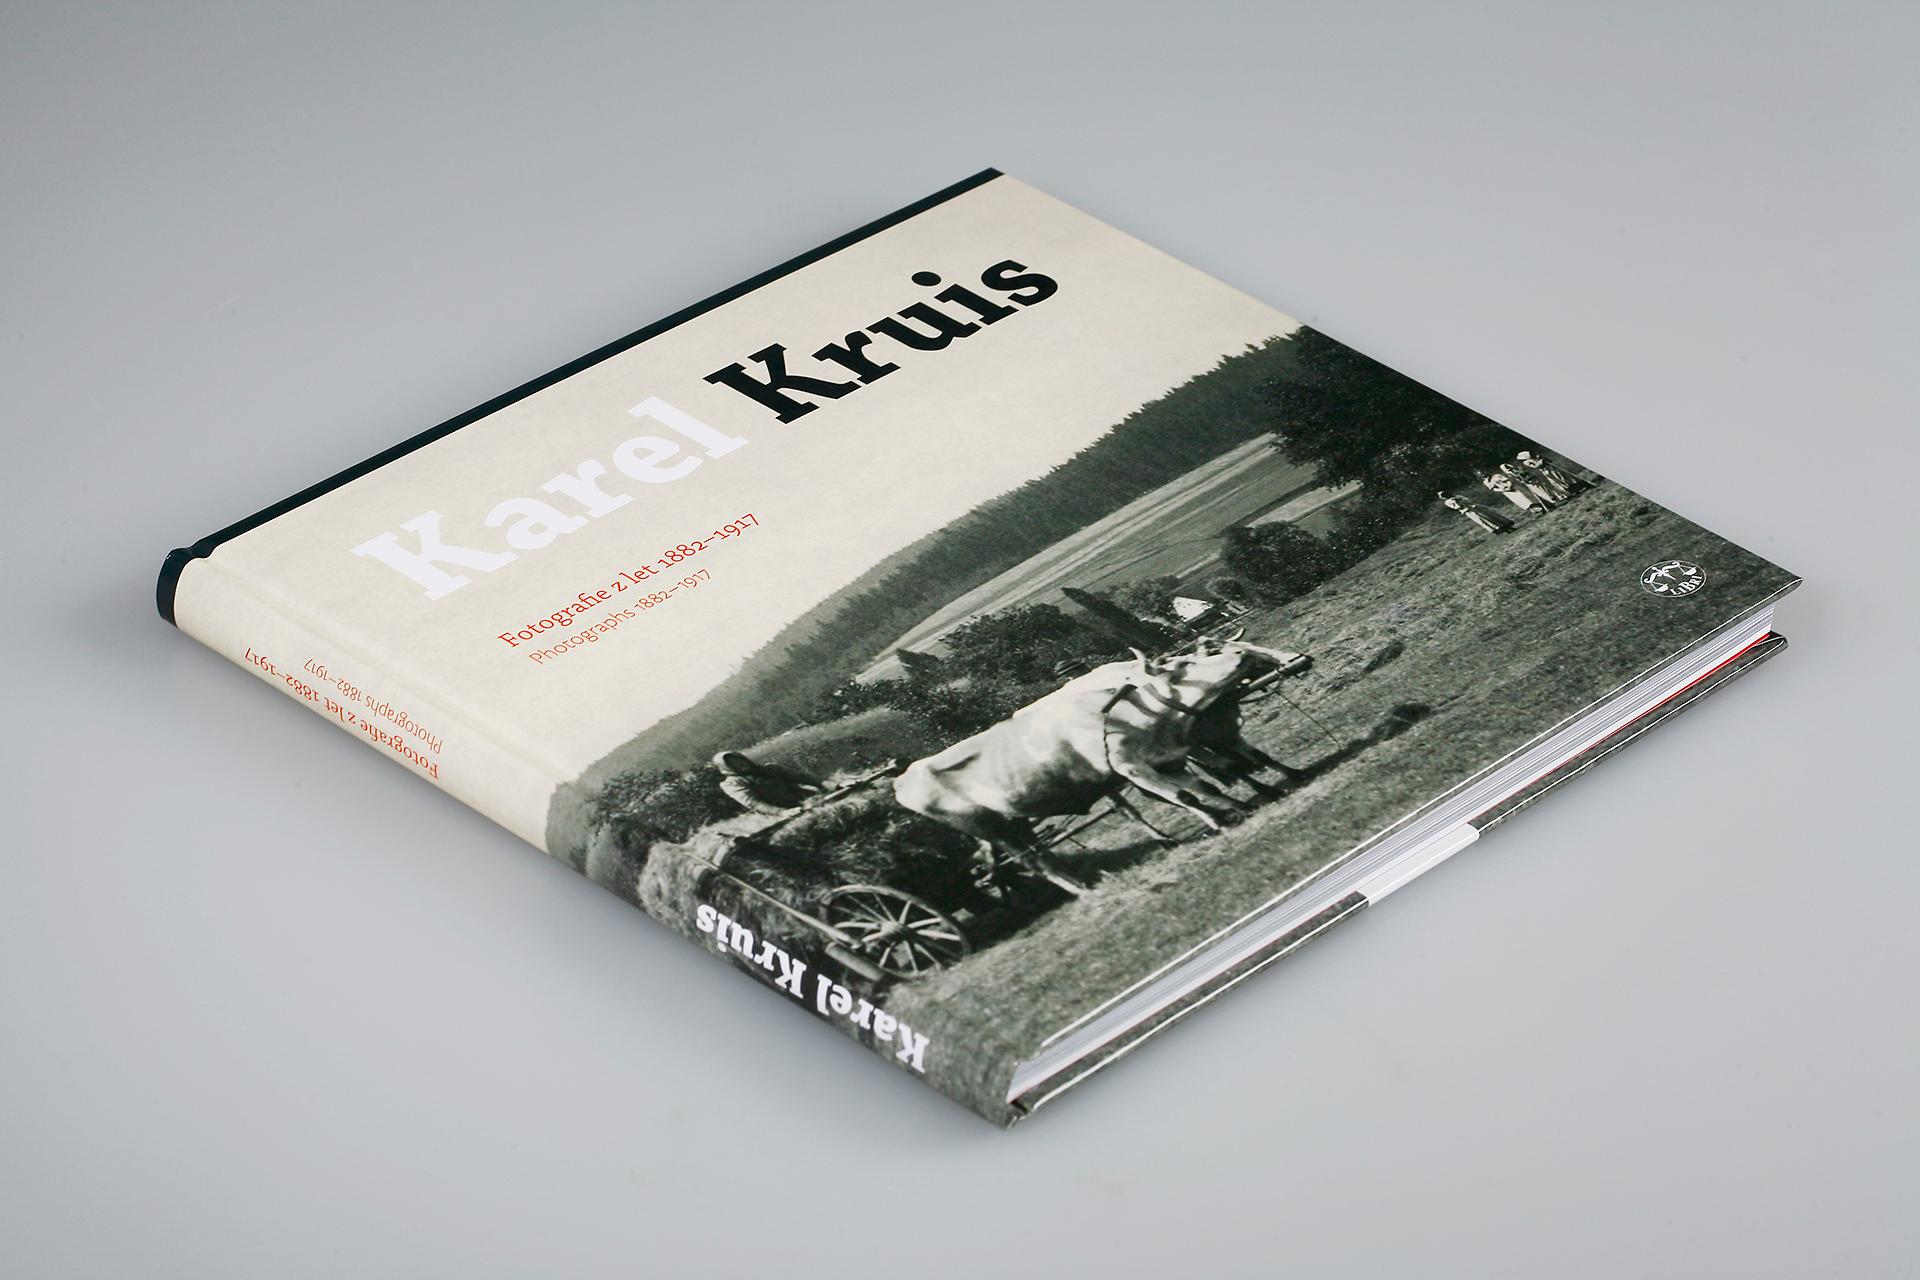 2007-Karel-Kruis-monografie-fotografa-MG_9880